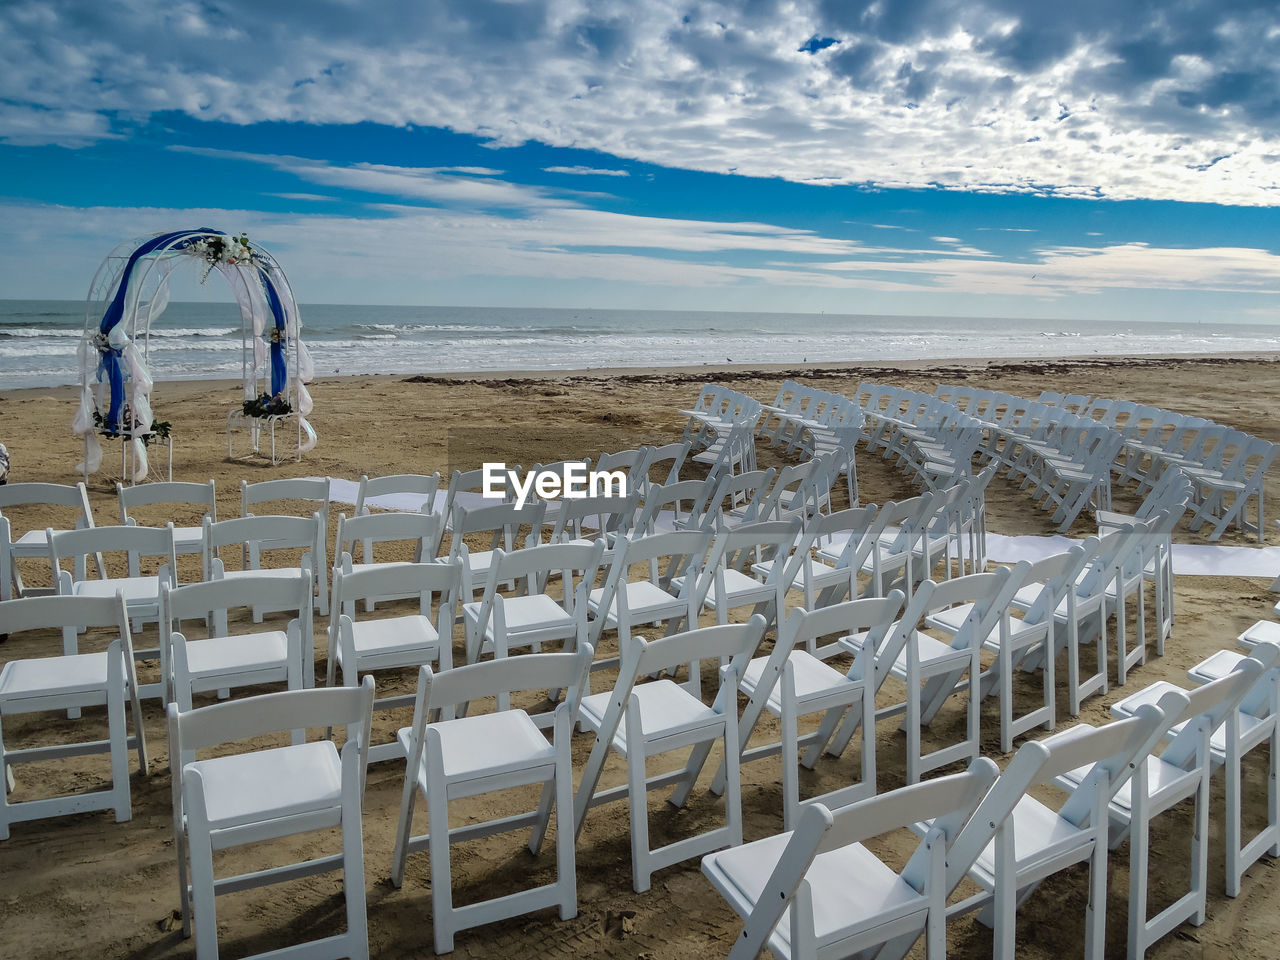 Chairs Arranged At Beach Against Cloudy Sky